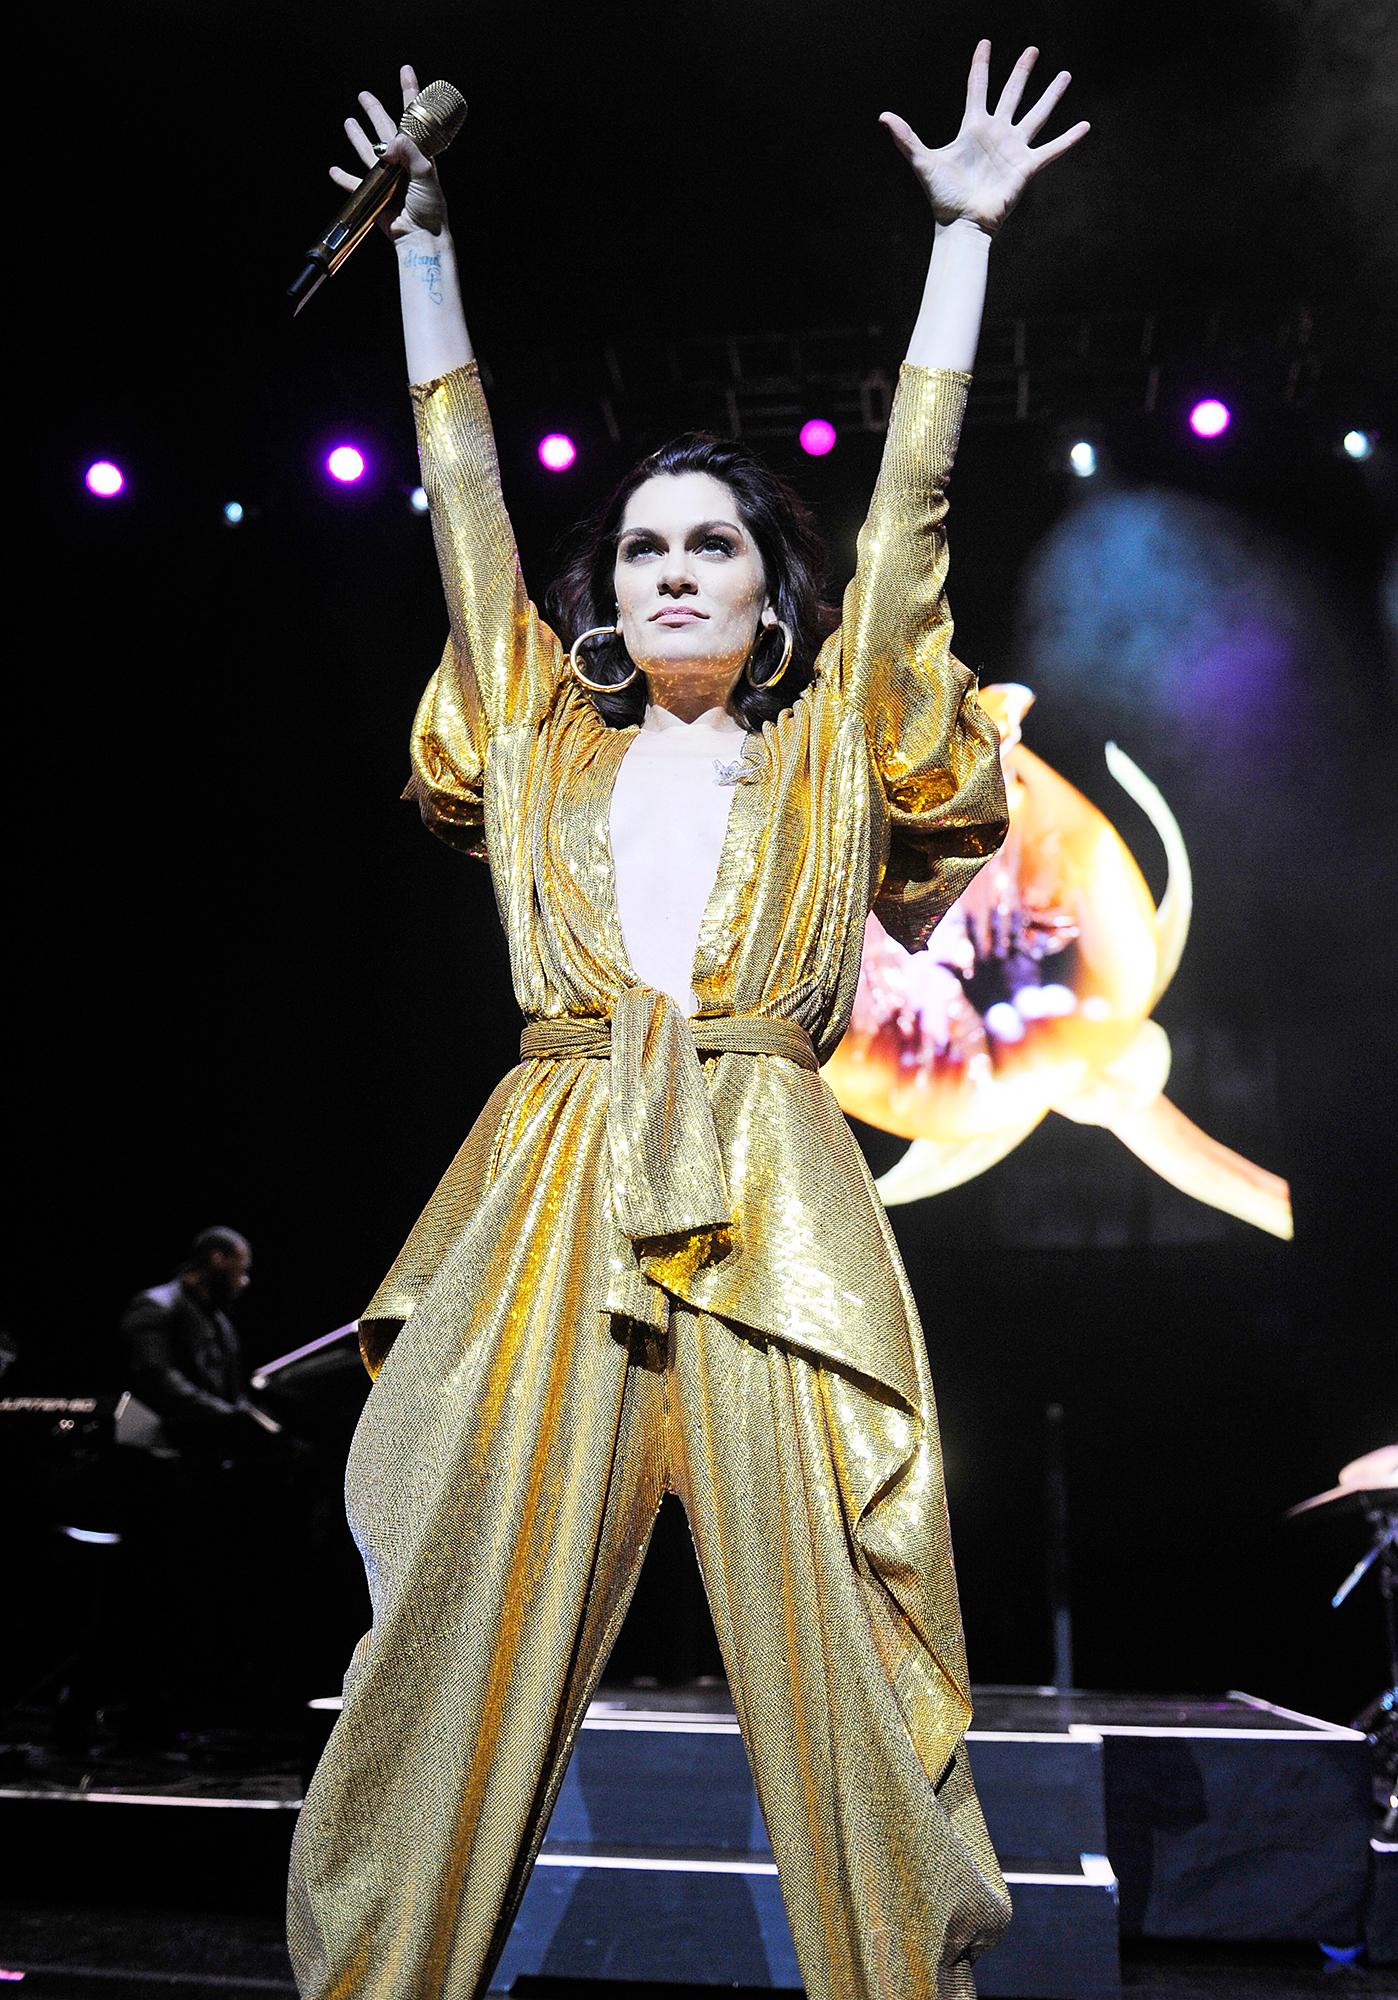 Channing Tatum Gushes Jessie J Royal Albert Hall Performance